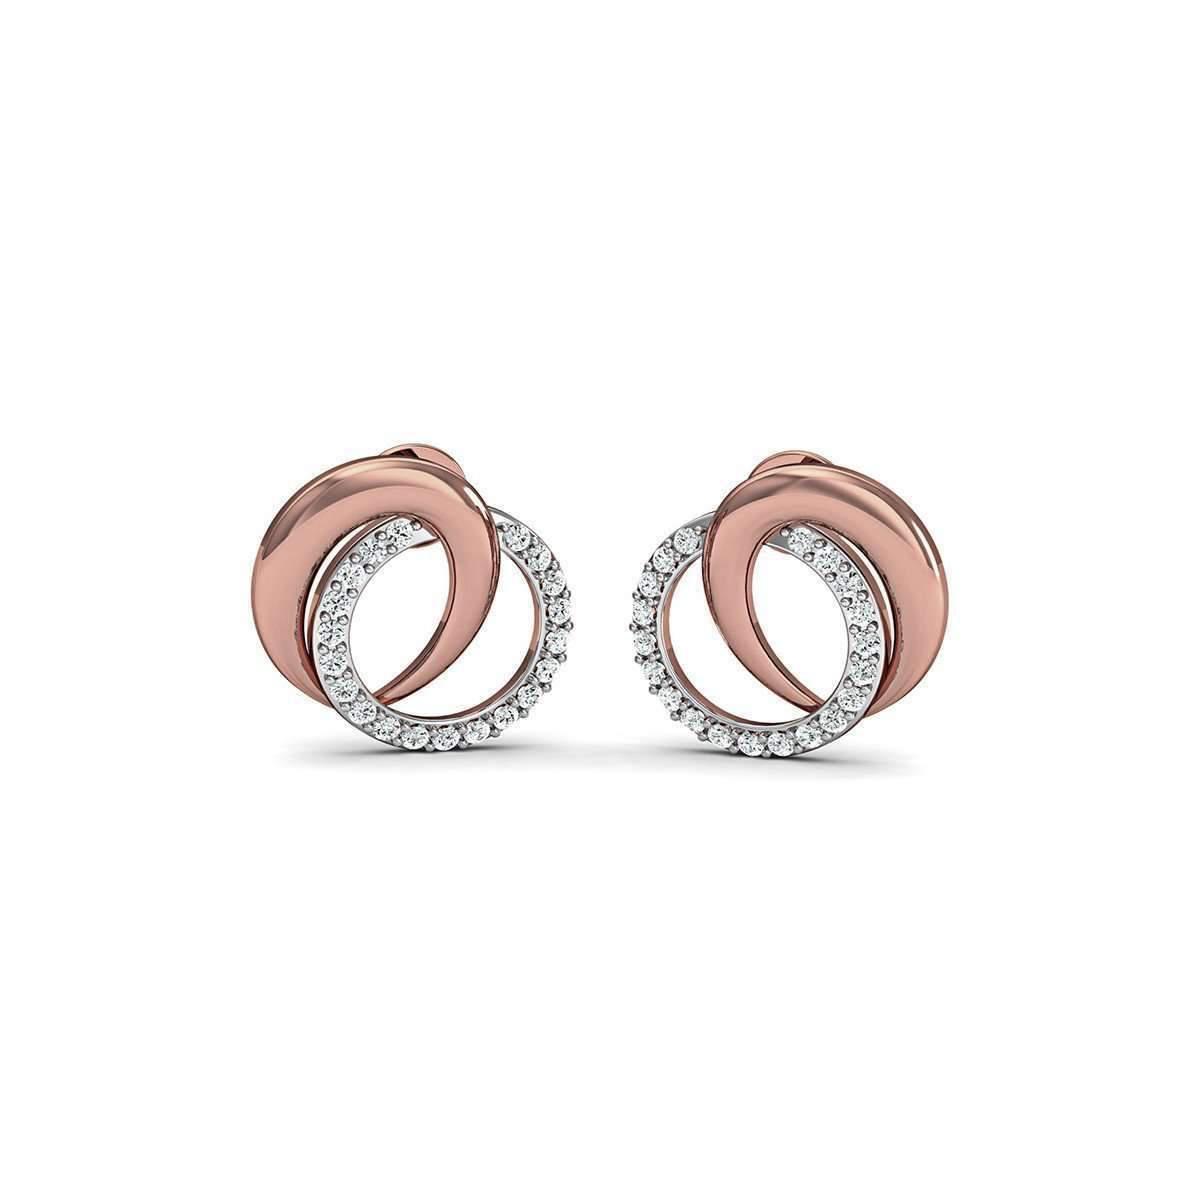 Diamoire Jewels Premium Diamond Earrings Nature Inspired in 18kt Rose Gold UbPMVXWpM